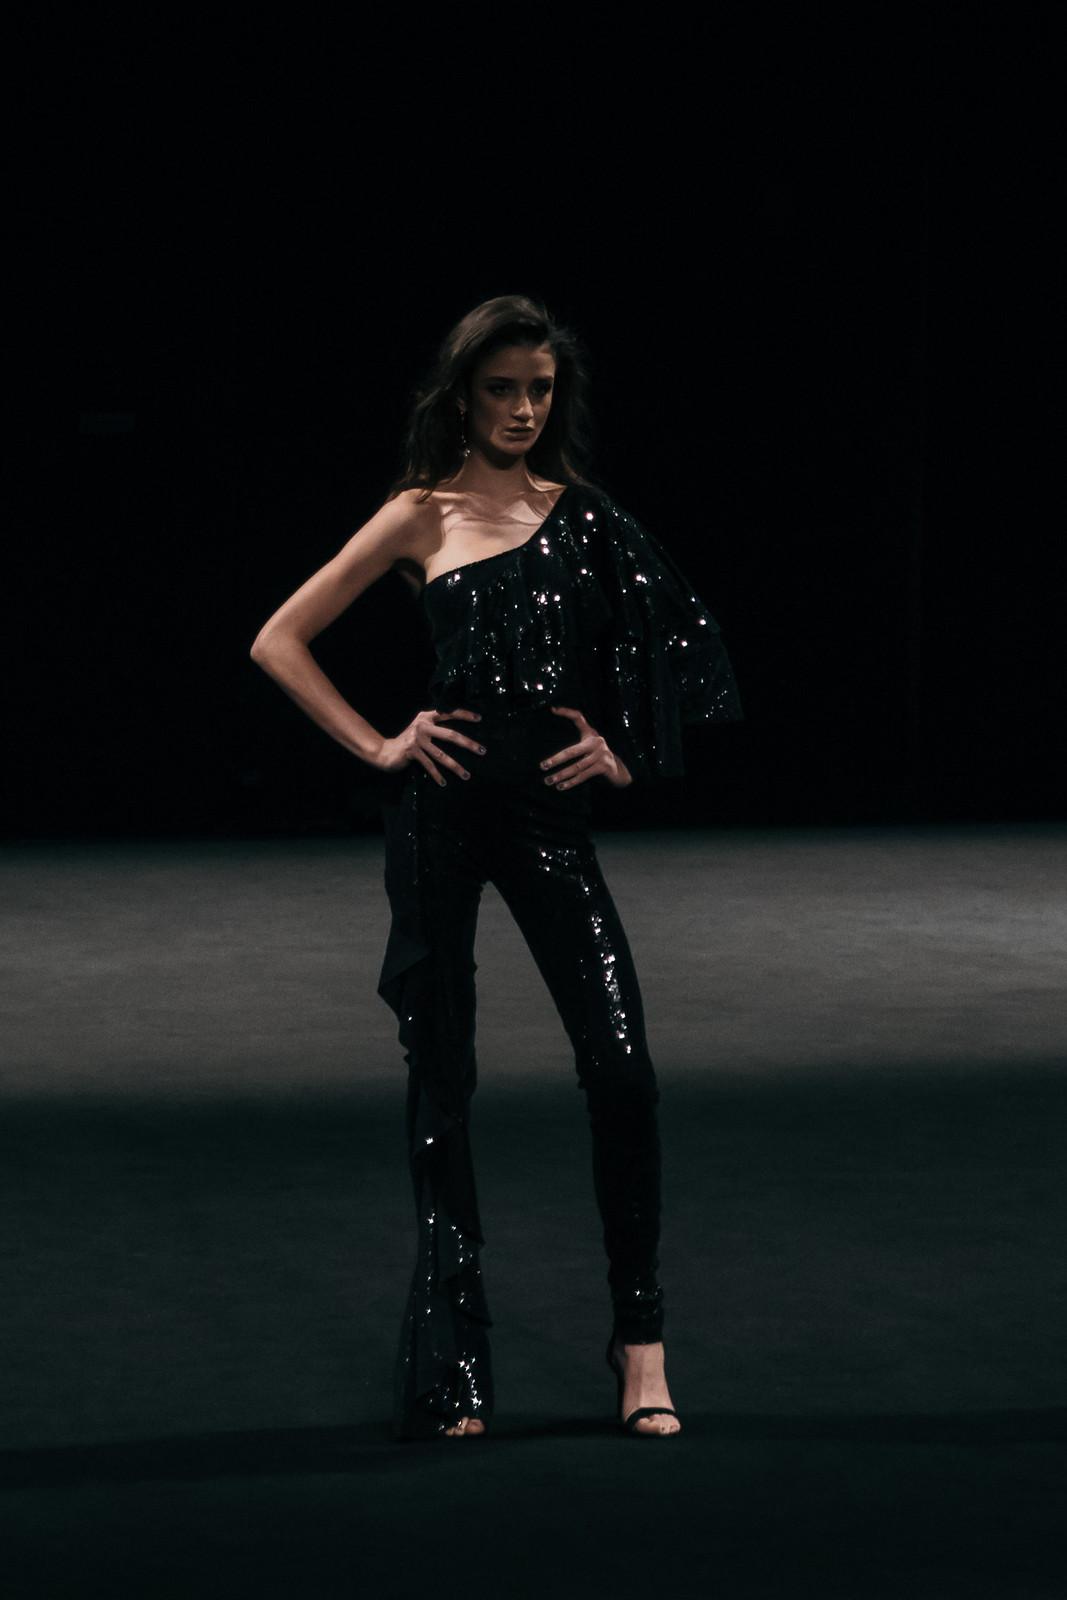 Jessie Chanes - Seams for a desire - 080 Bacelona Fashion #080bcnfasion -59